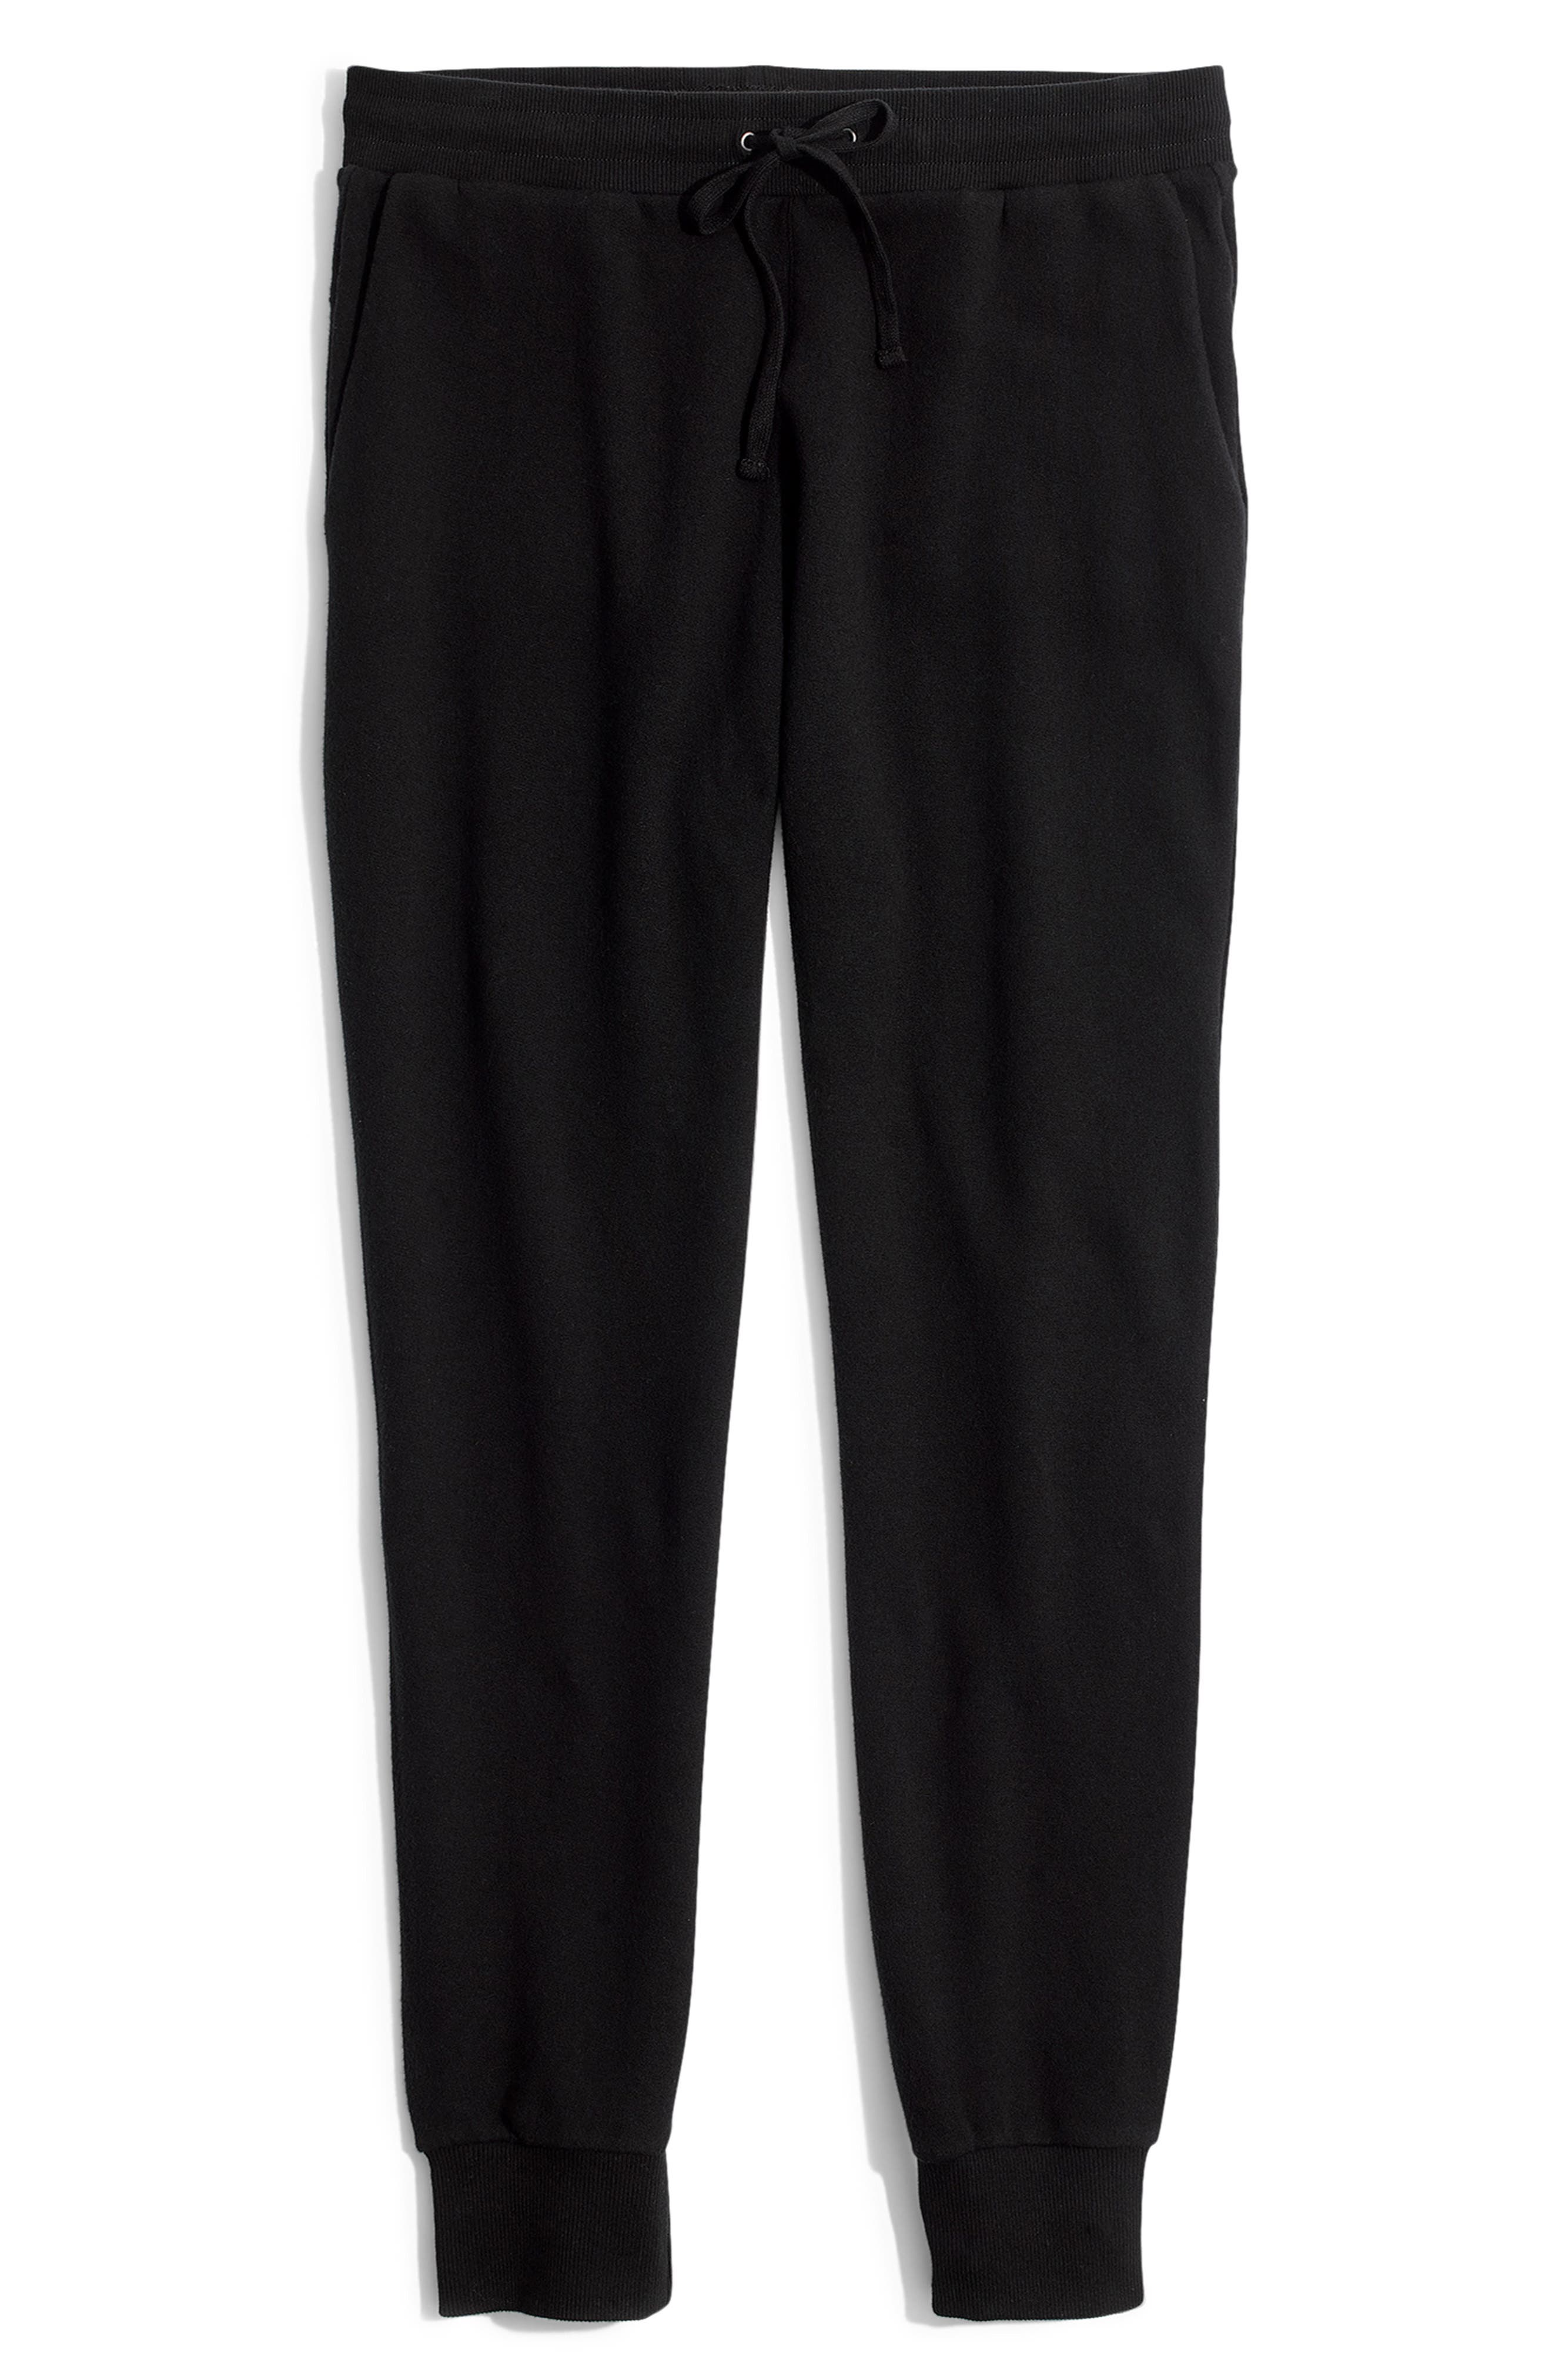 Terry Trouser Sweatpants,                             Alternate thumbnail 6, color,                             001